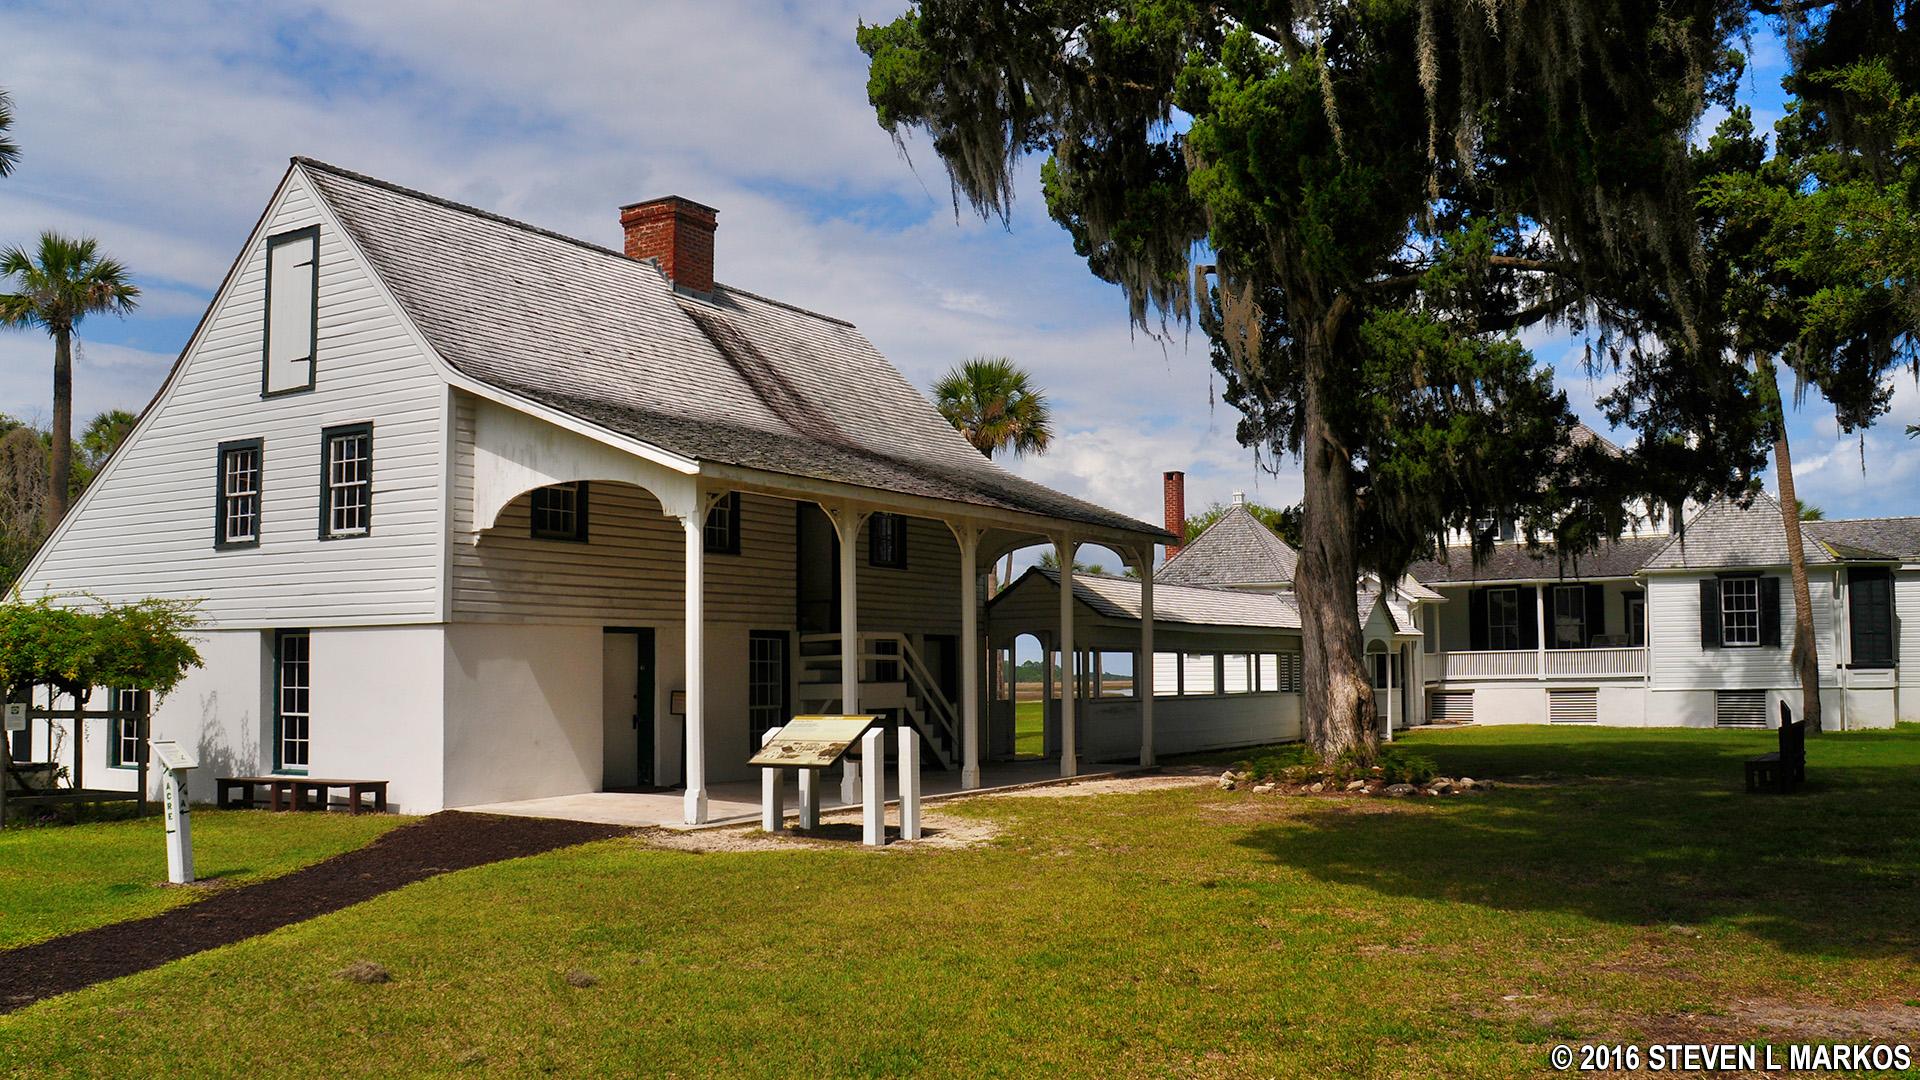 Plantation Kitchen House Timucuan Ecological And Historic Preserve  Kingsley Plantation